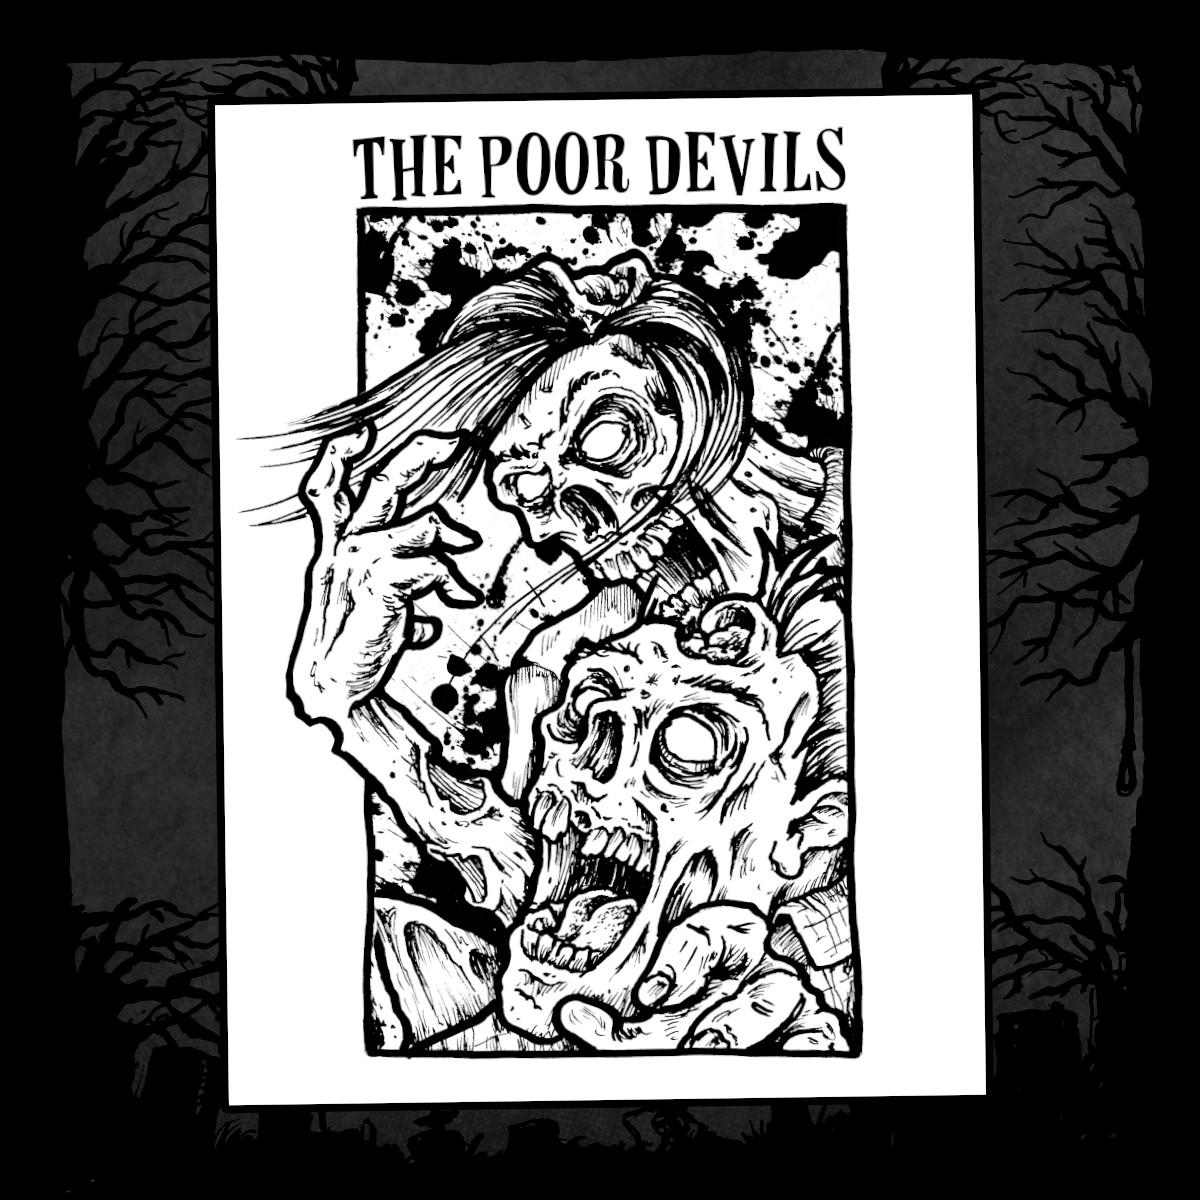 Backpatch - The Poor Devils - Skulls (Farbe weiß, Druck schwarz)